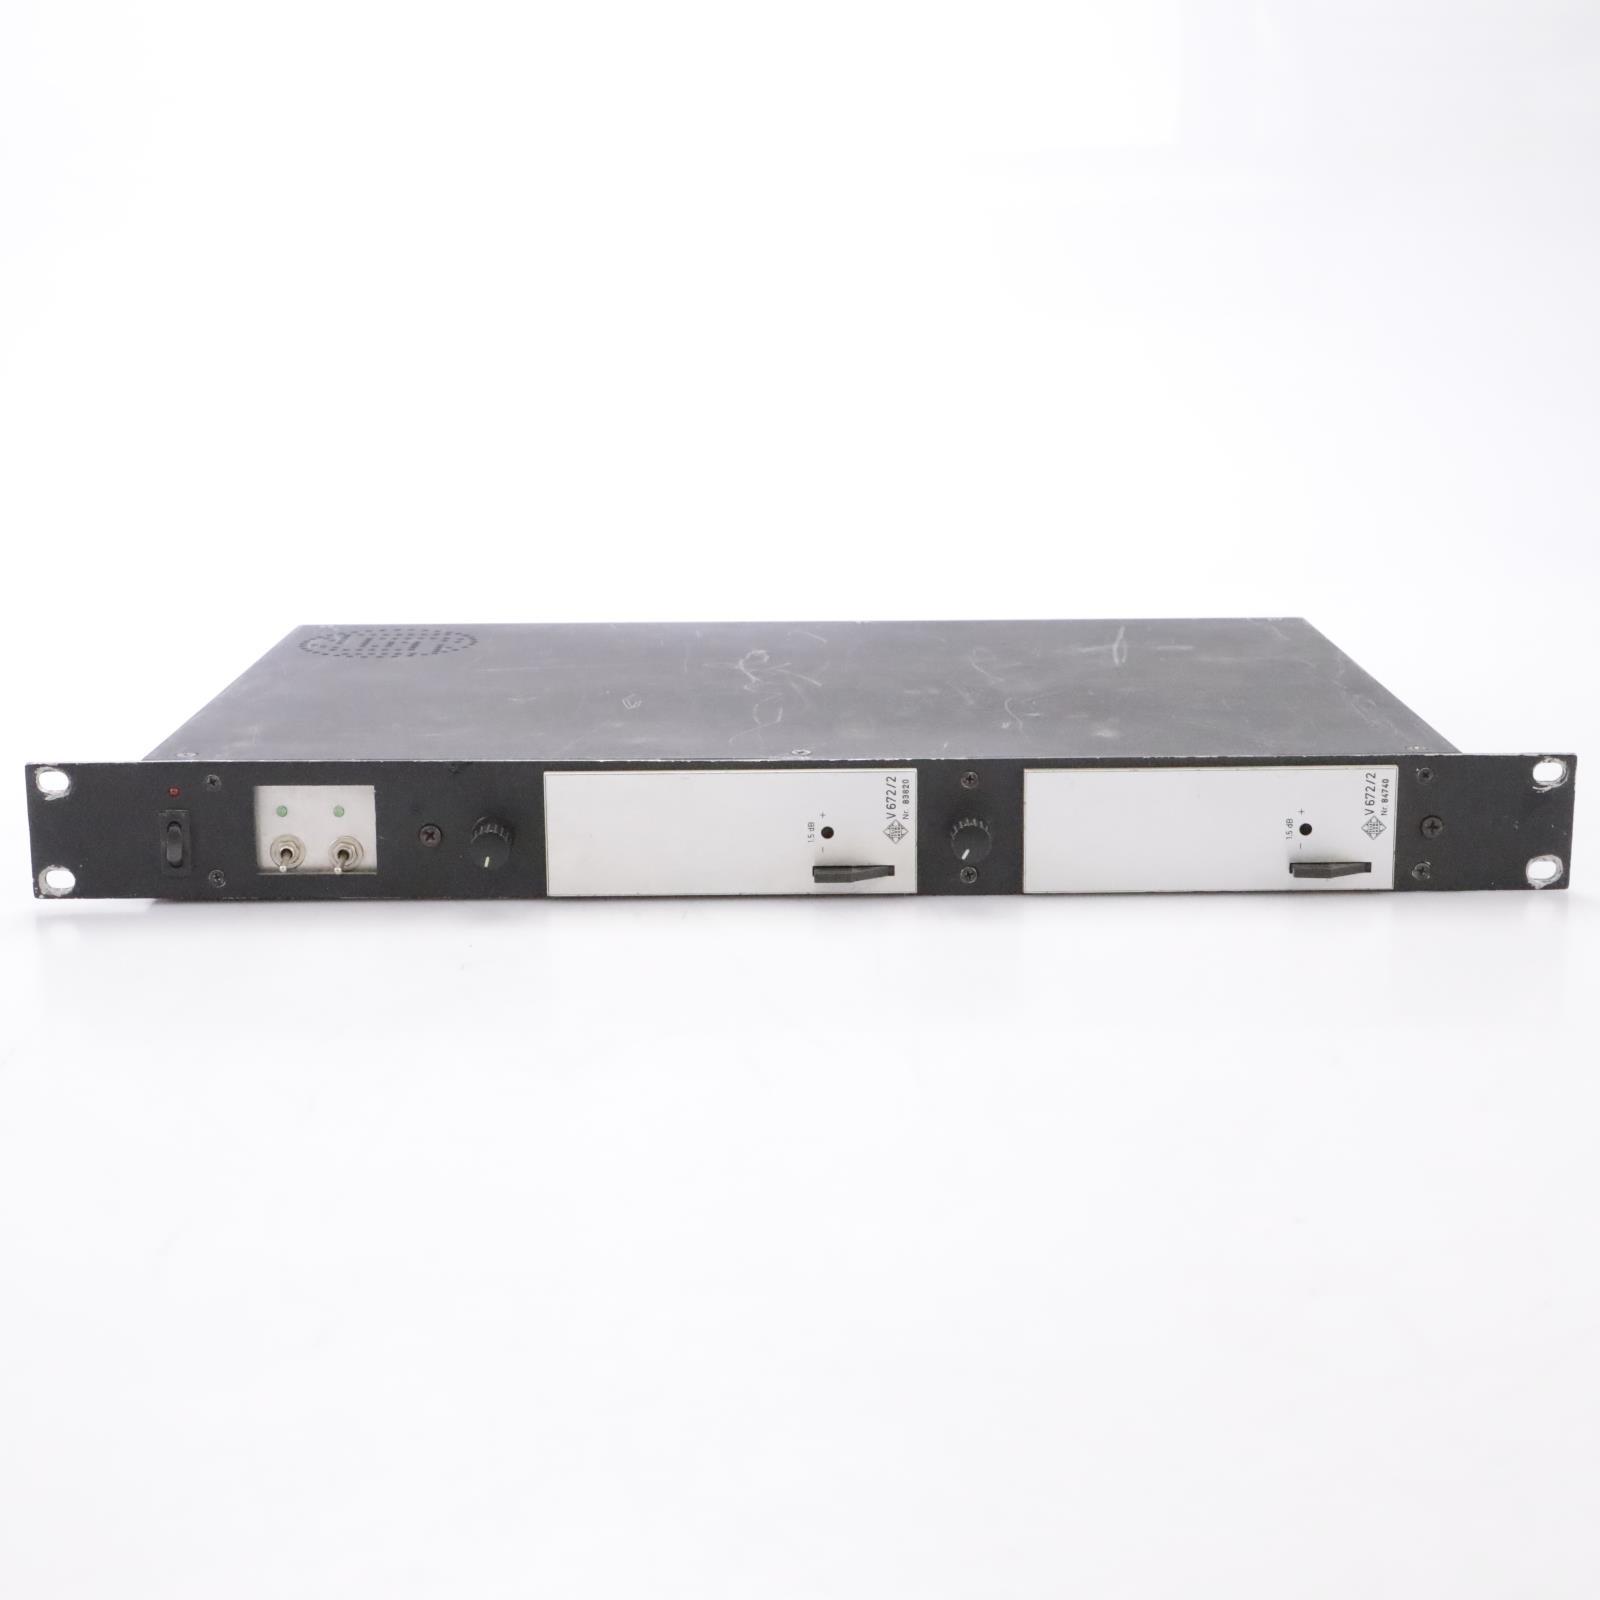 2 Vintage Telefunken V672/2 Microphone Preamps in Powered Rack #43696